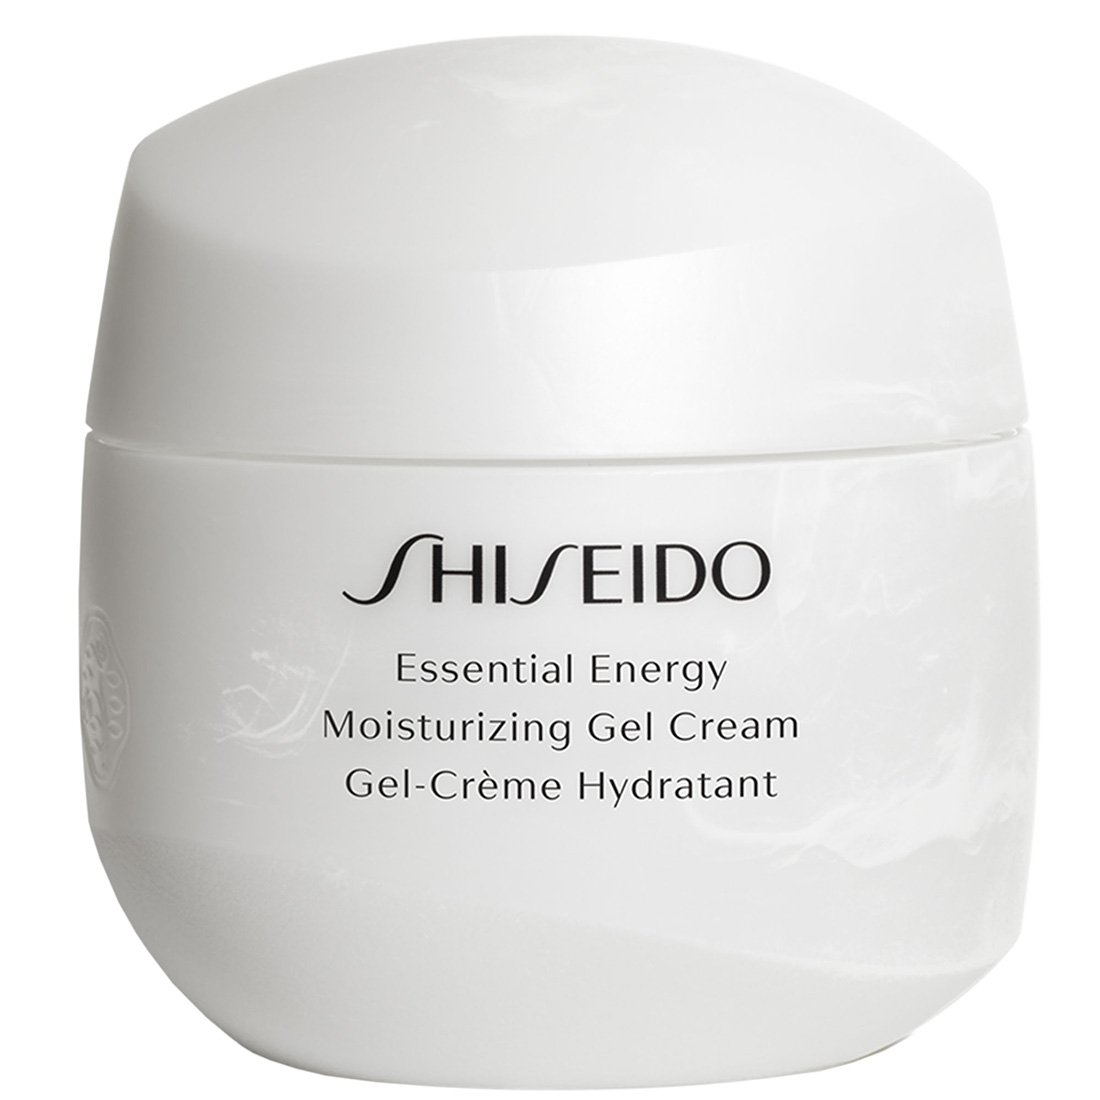 Shiseido - Essential Energy - Gel-Crème Hydratant - 50 ml